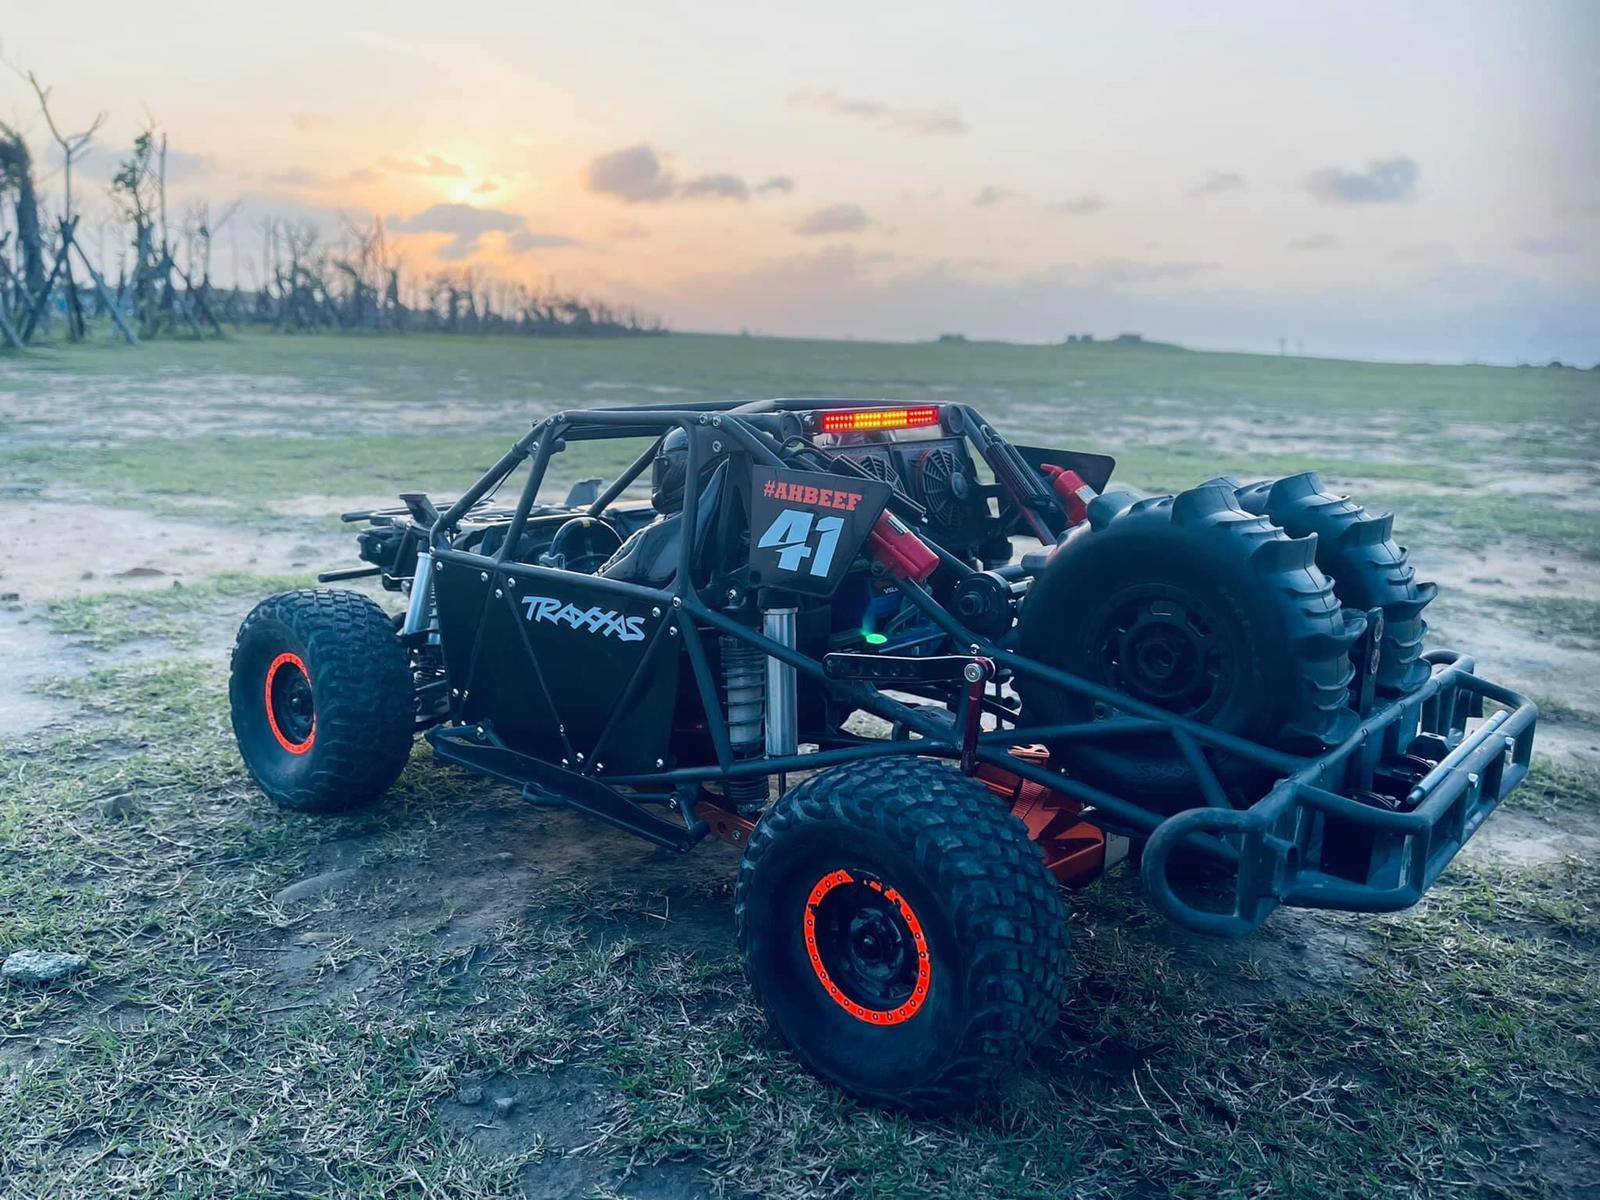 UDR Support Roue de secours - Ulimited Desert Racer wheel vertival Dual Tire Mount - Spare Wheel Udr_mo12